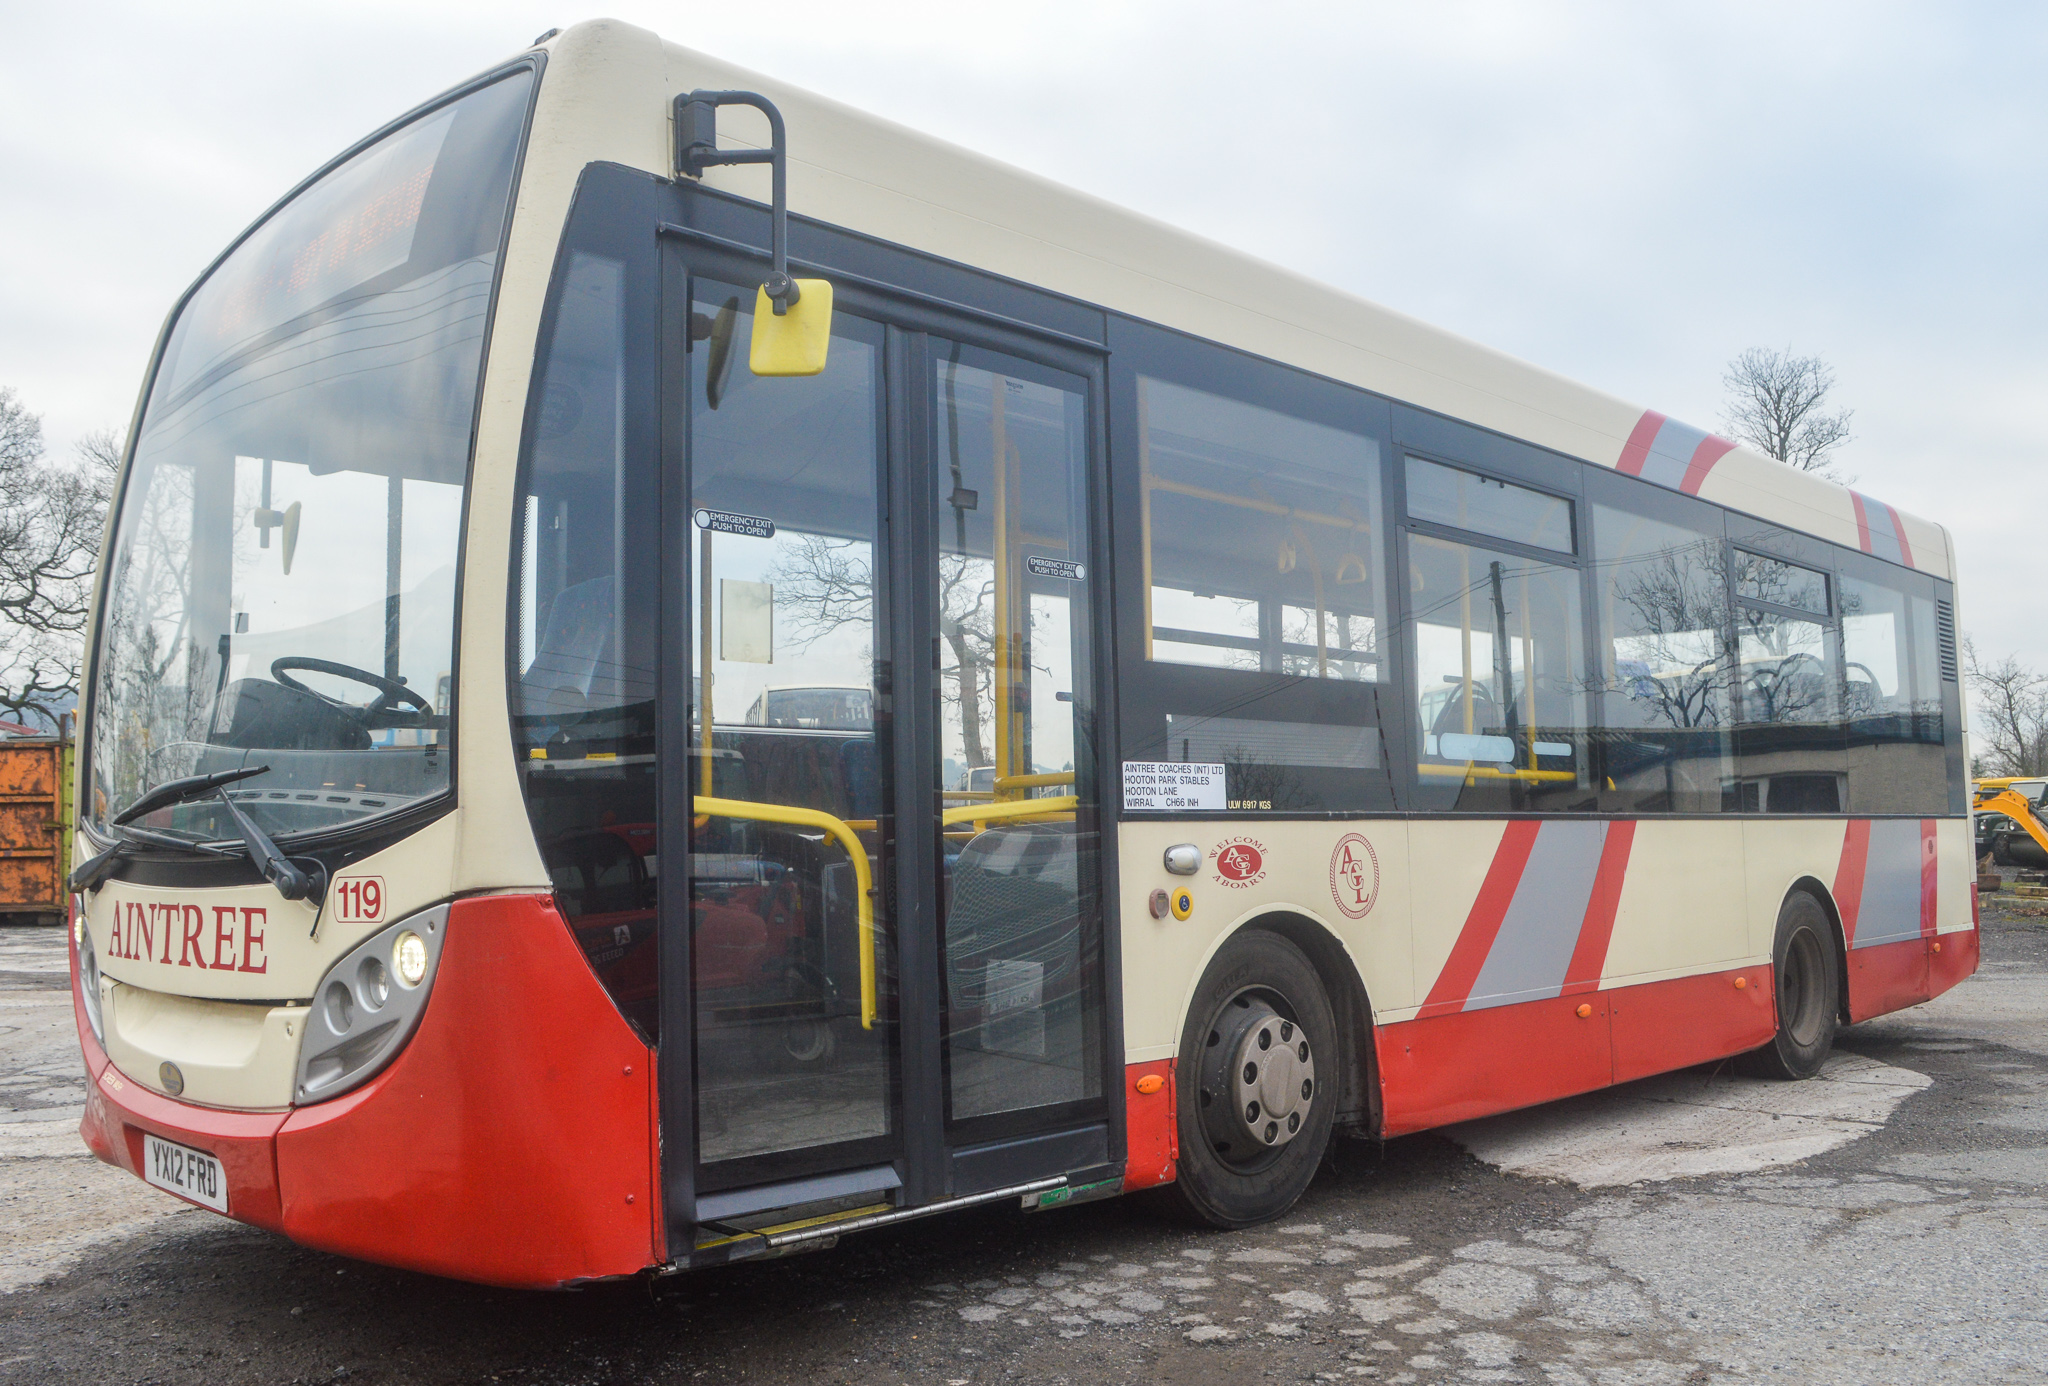 Lot 2 - Alexander Dennis Dart 4 Enviro 2000 29 seat single deck service bus Registration Number: YX12 FRD